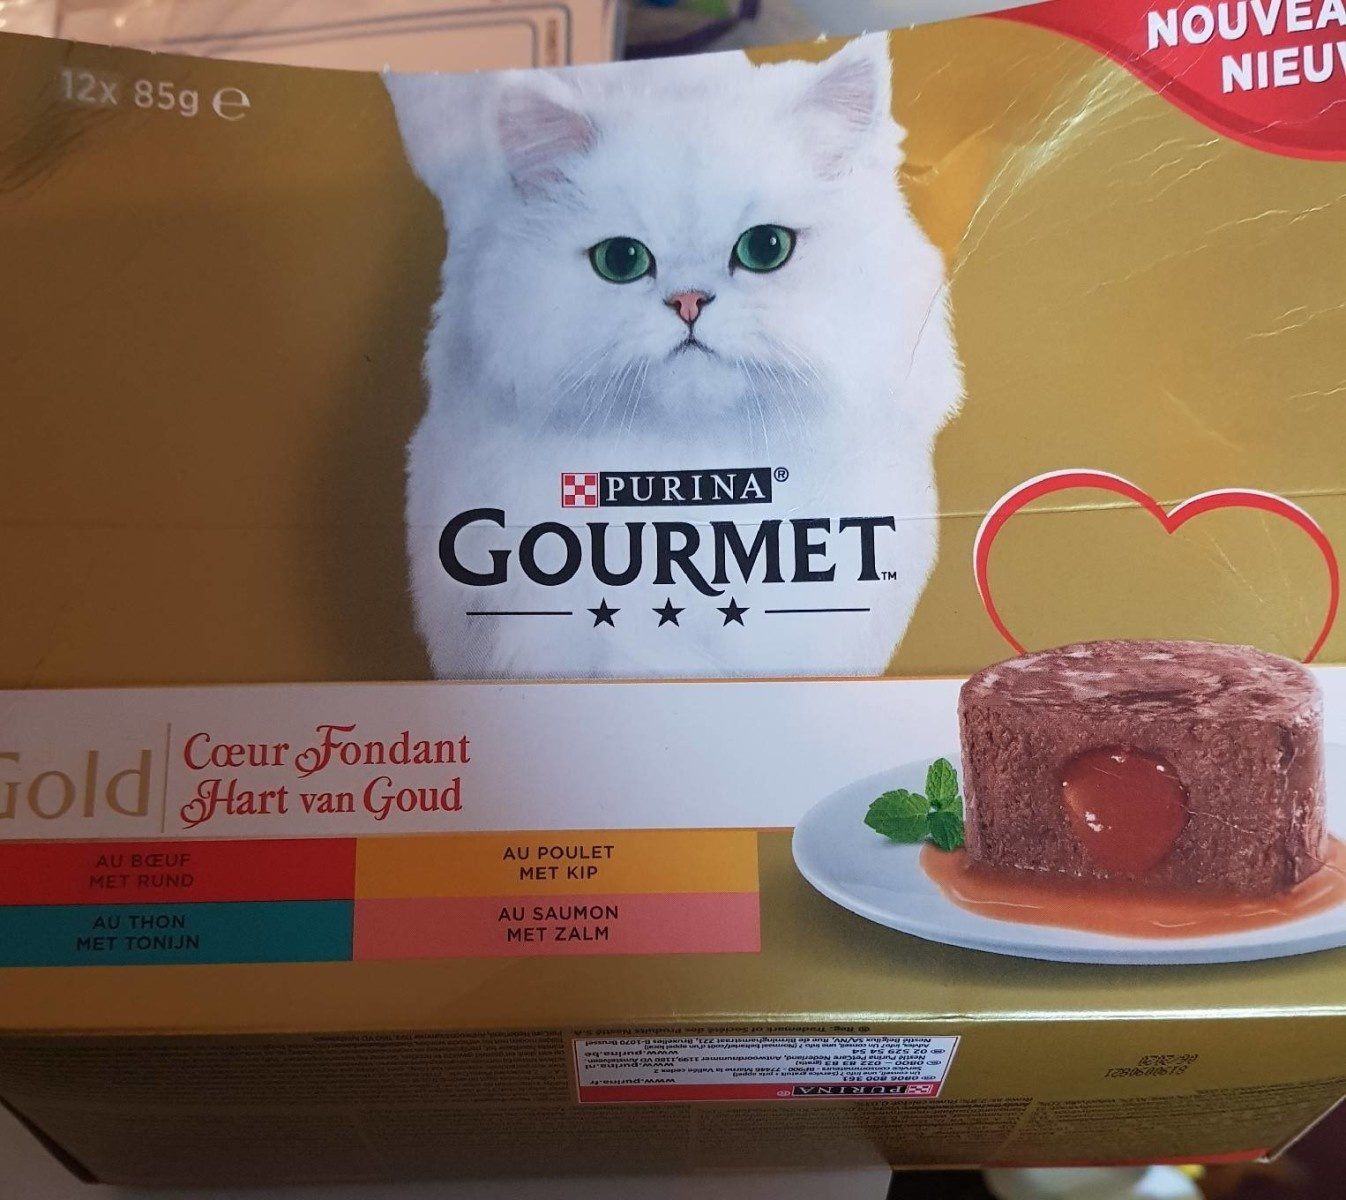 Gourmet - Product - fr